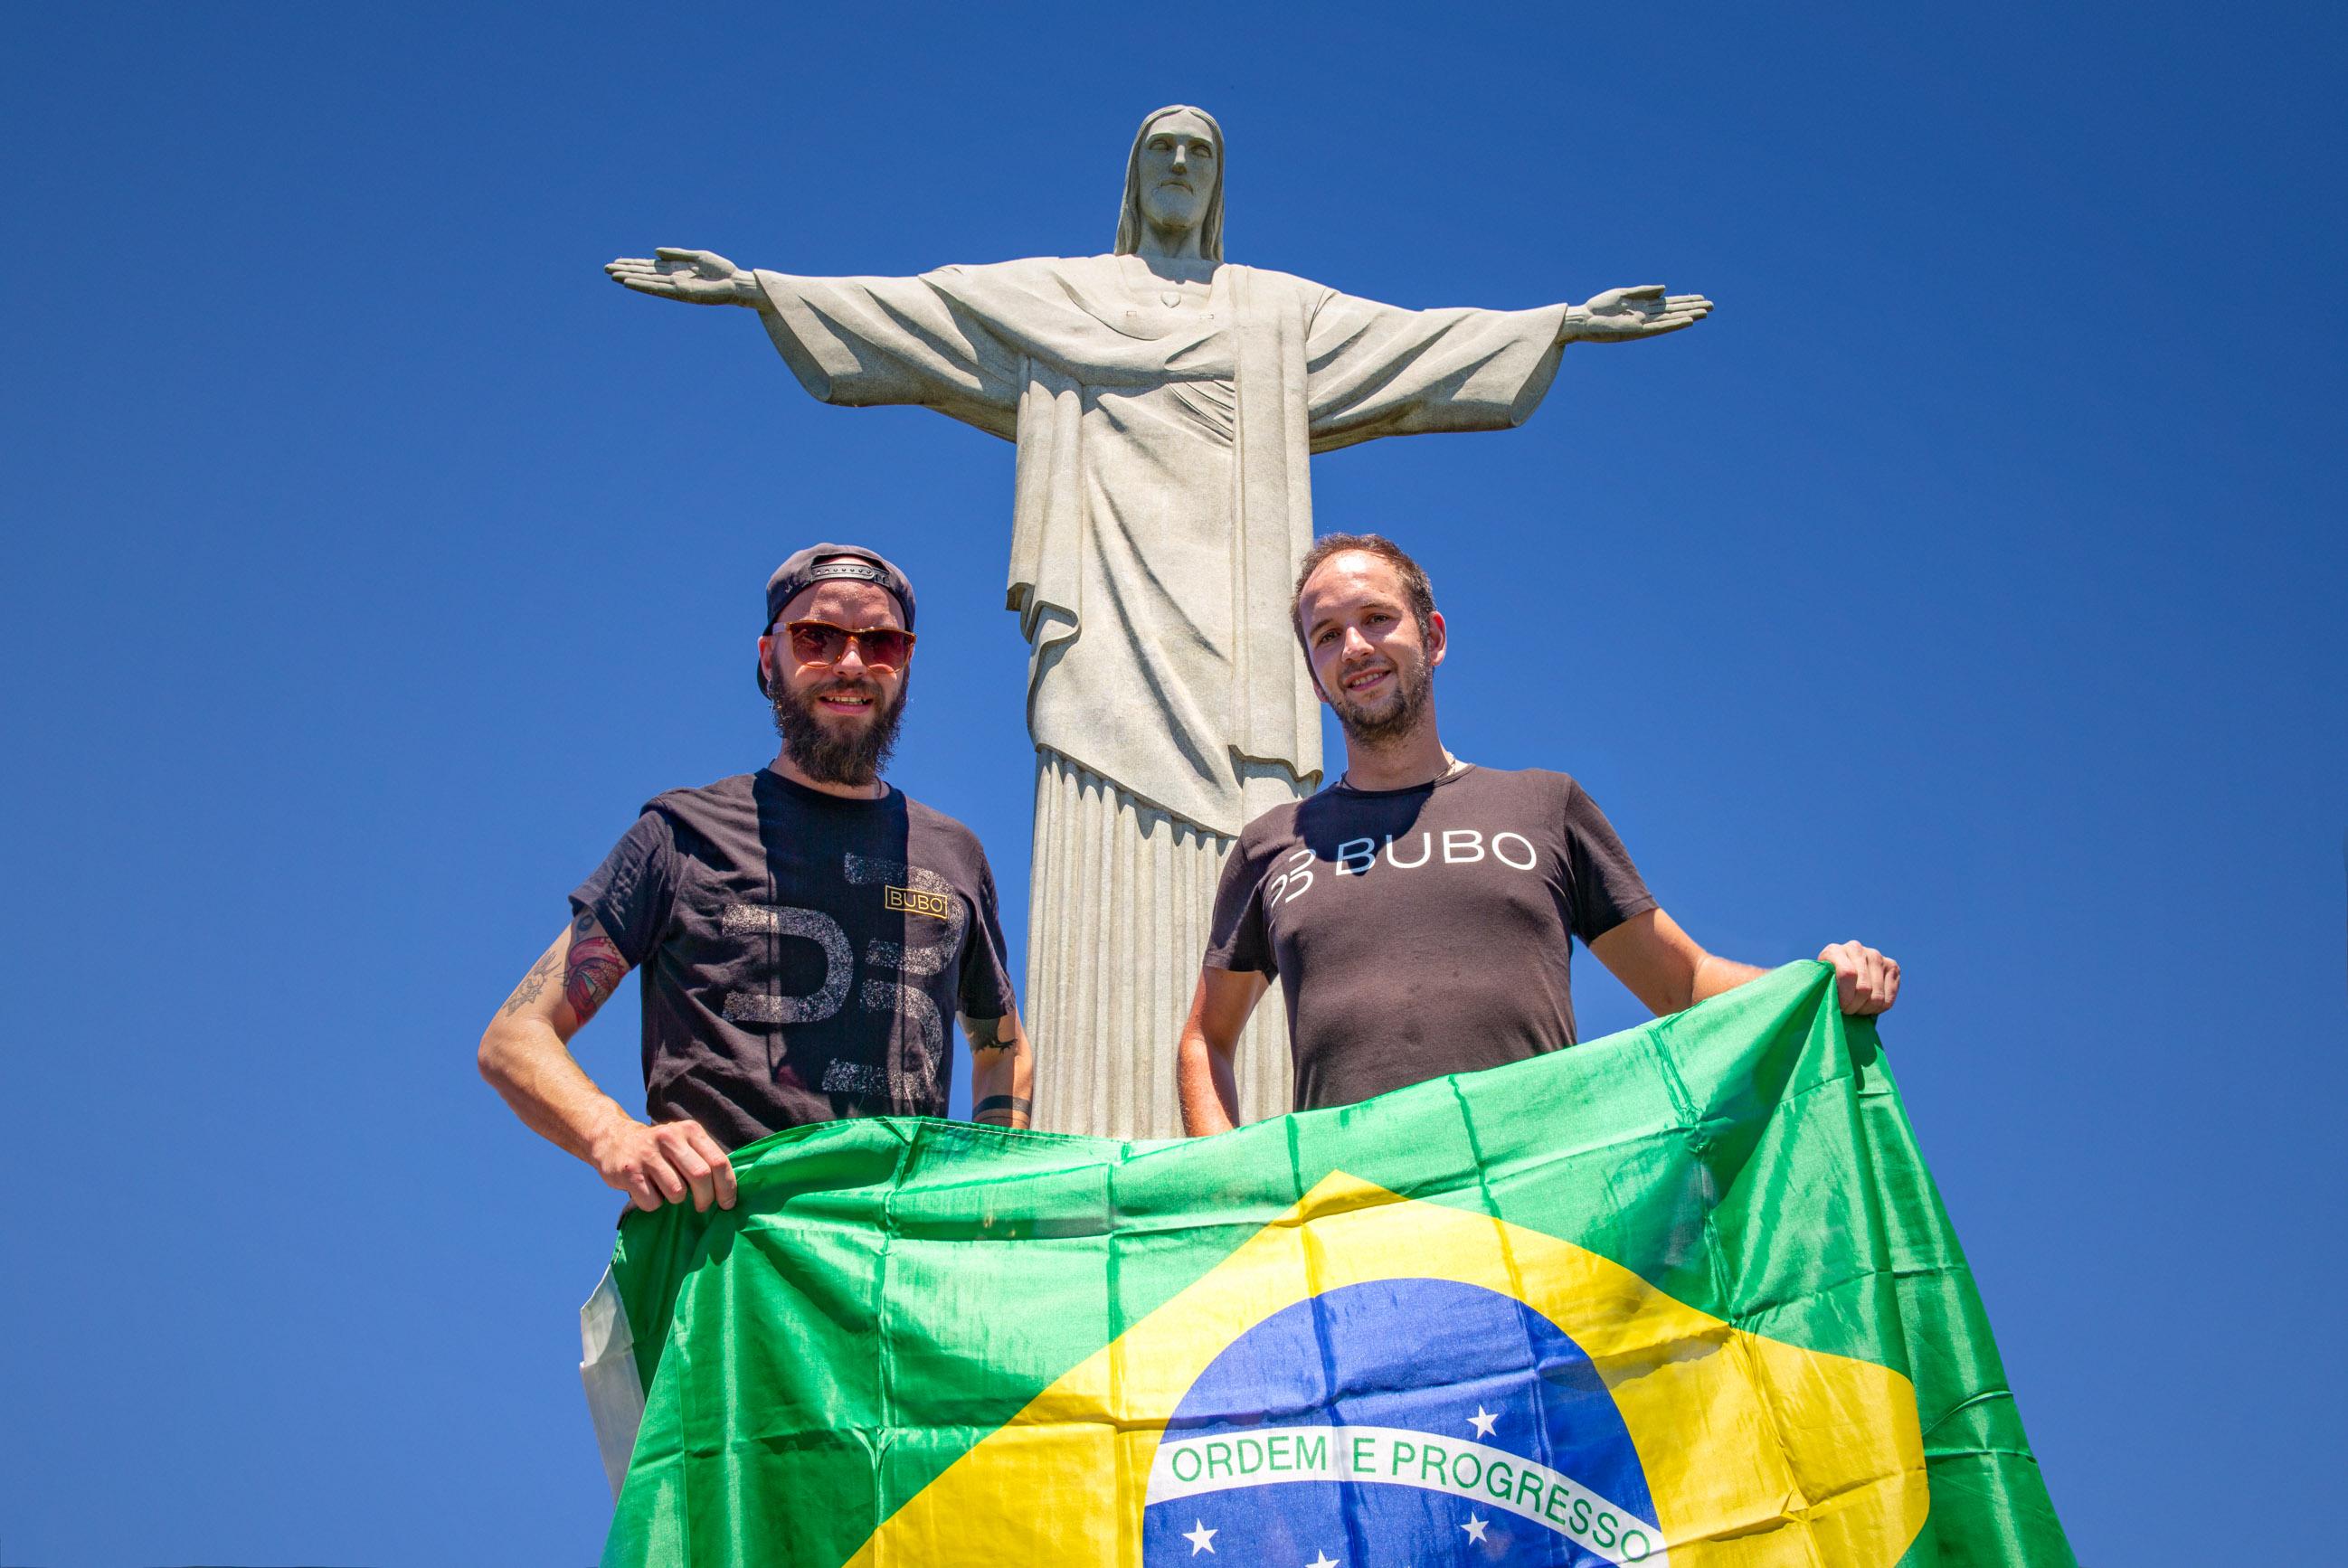 https://bubo.sk/uploads/galleries/7343/lubosfellner_brazilia_retus_l1006691-8.jpg